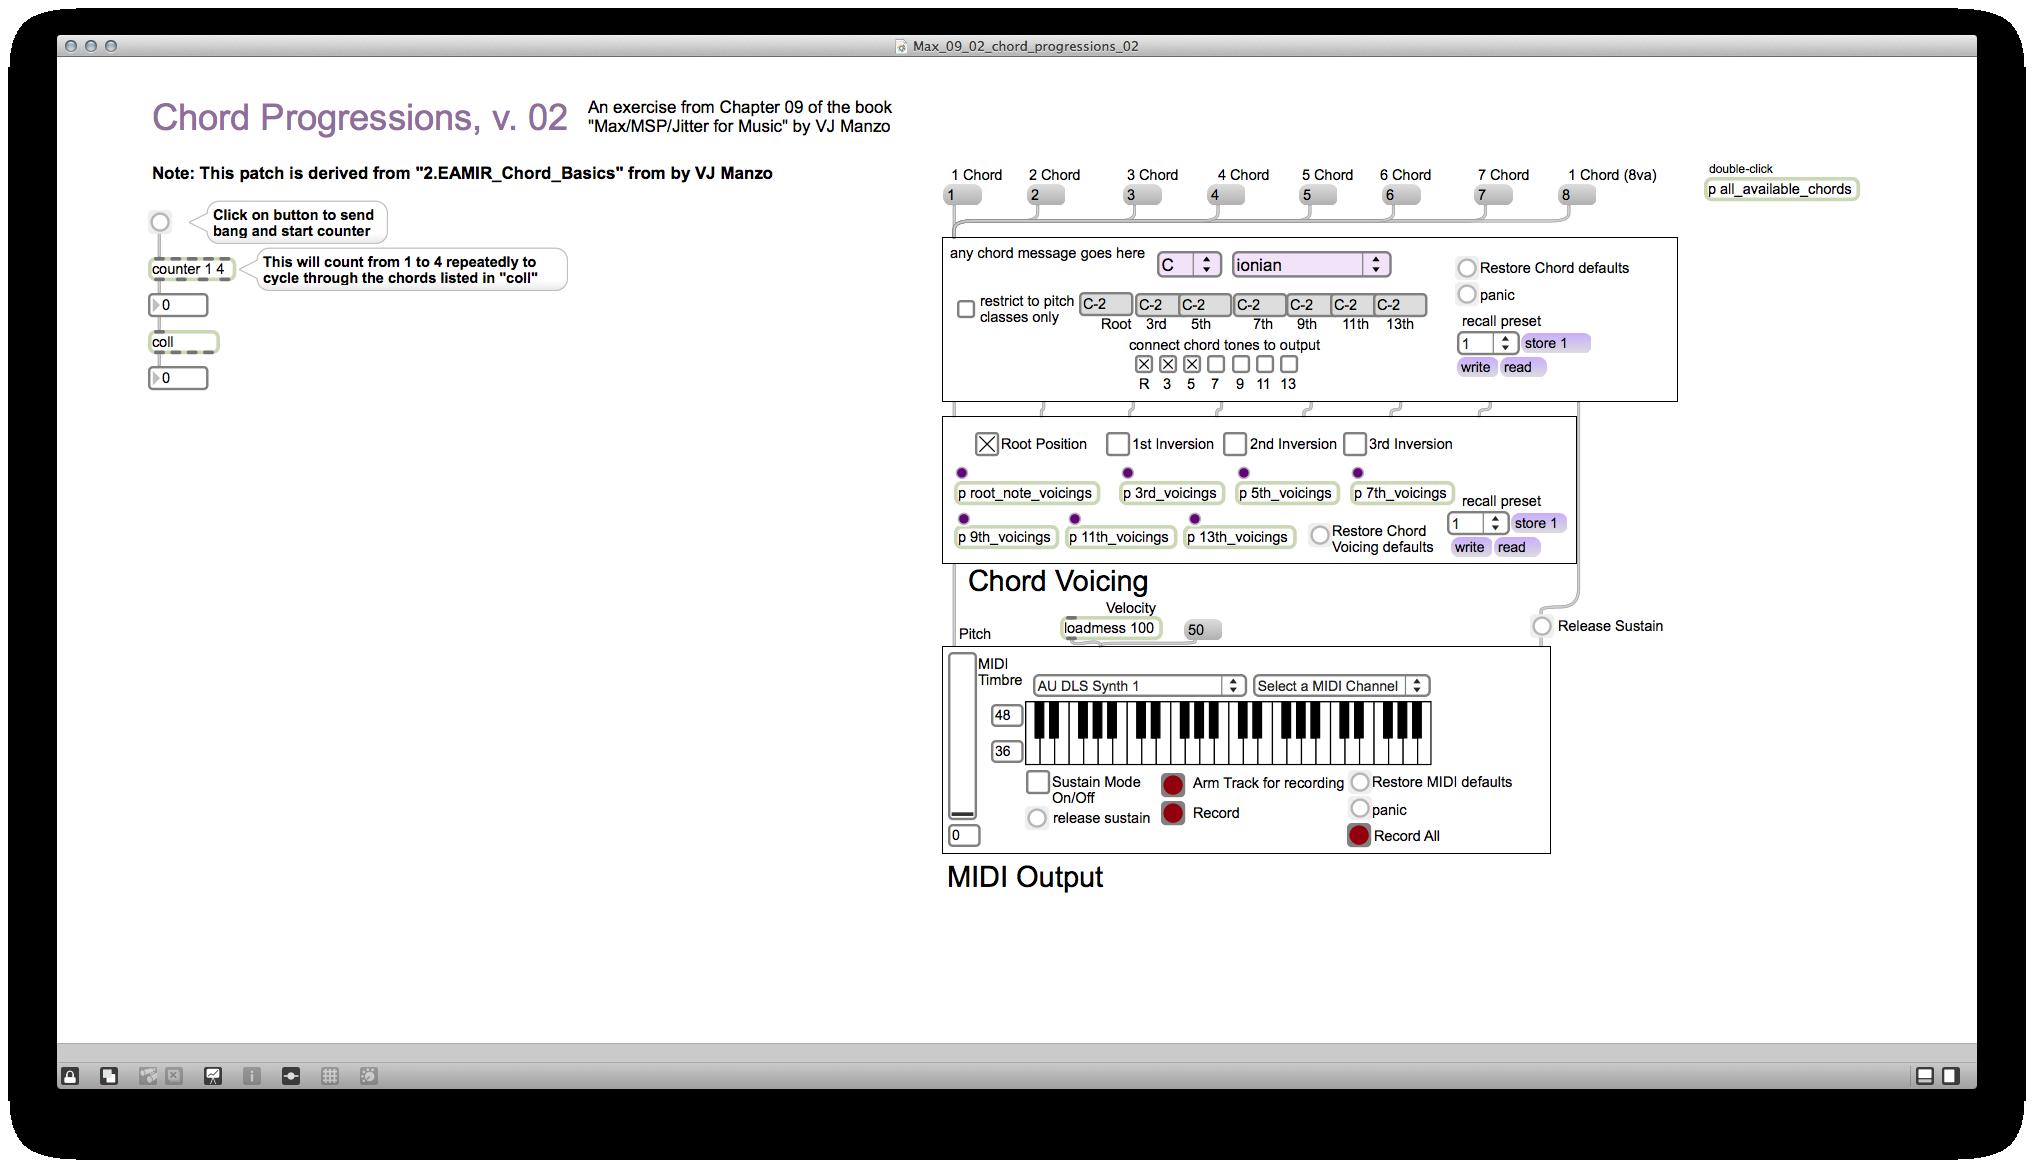 max_09_02_chord_progressions_02.png